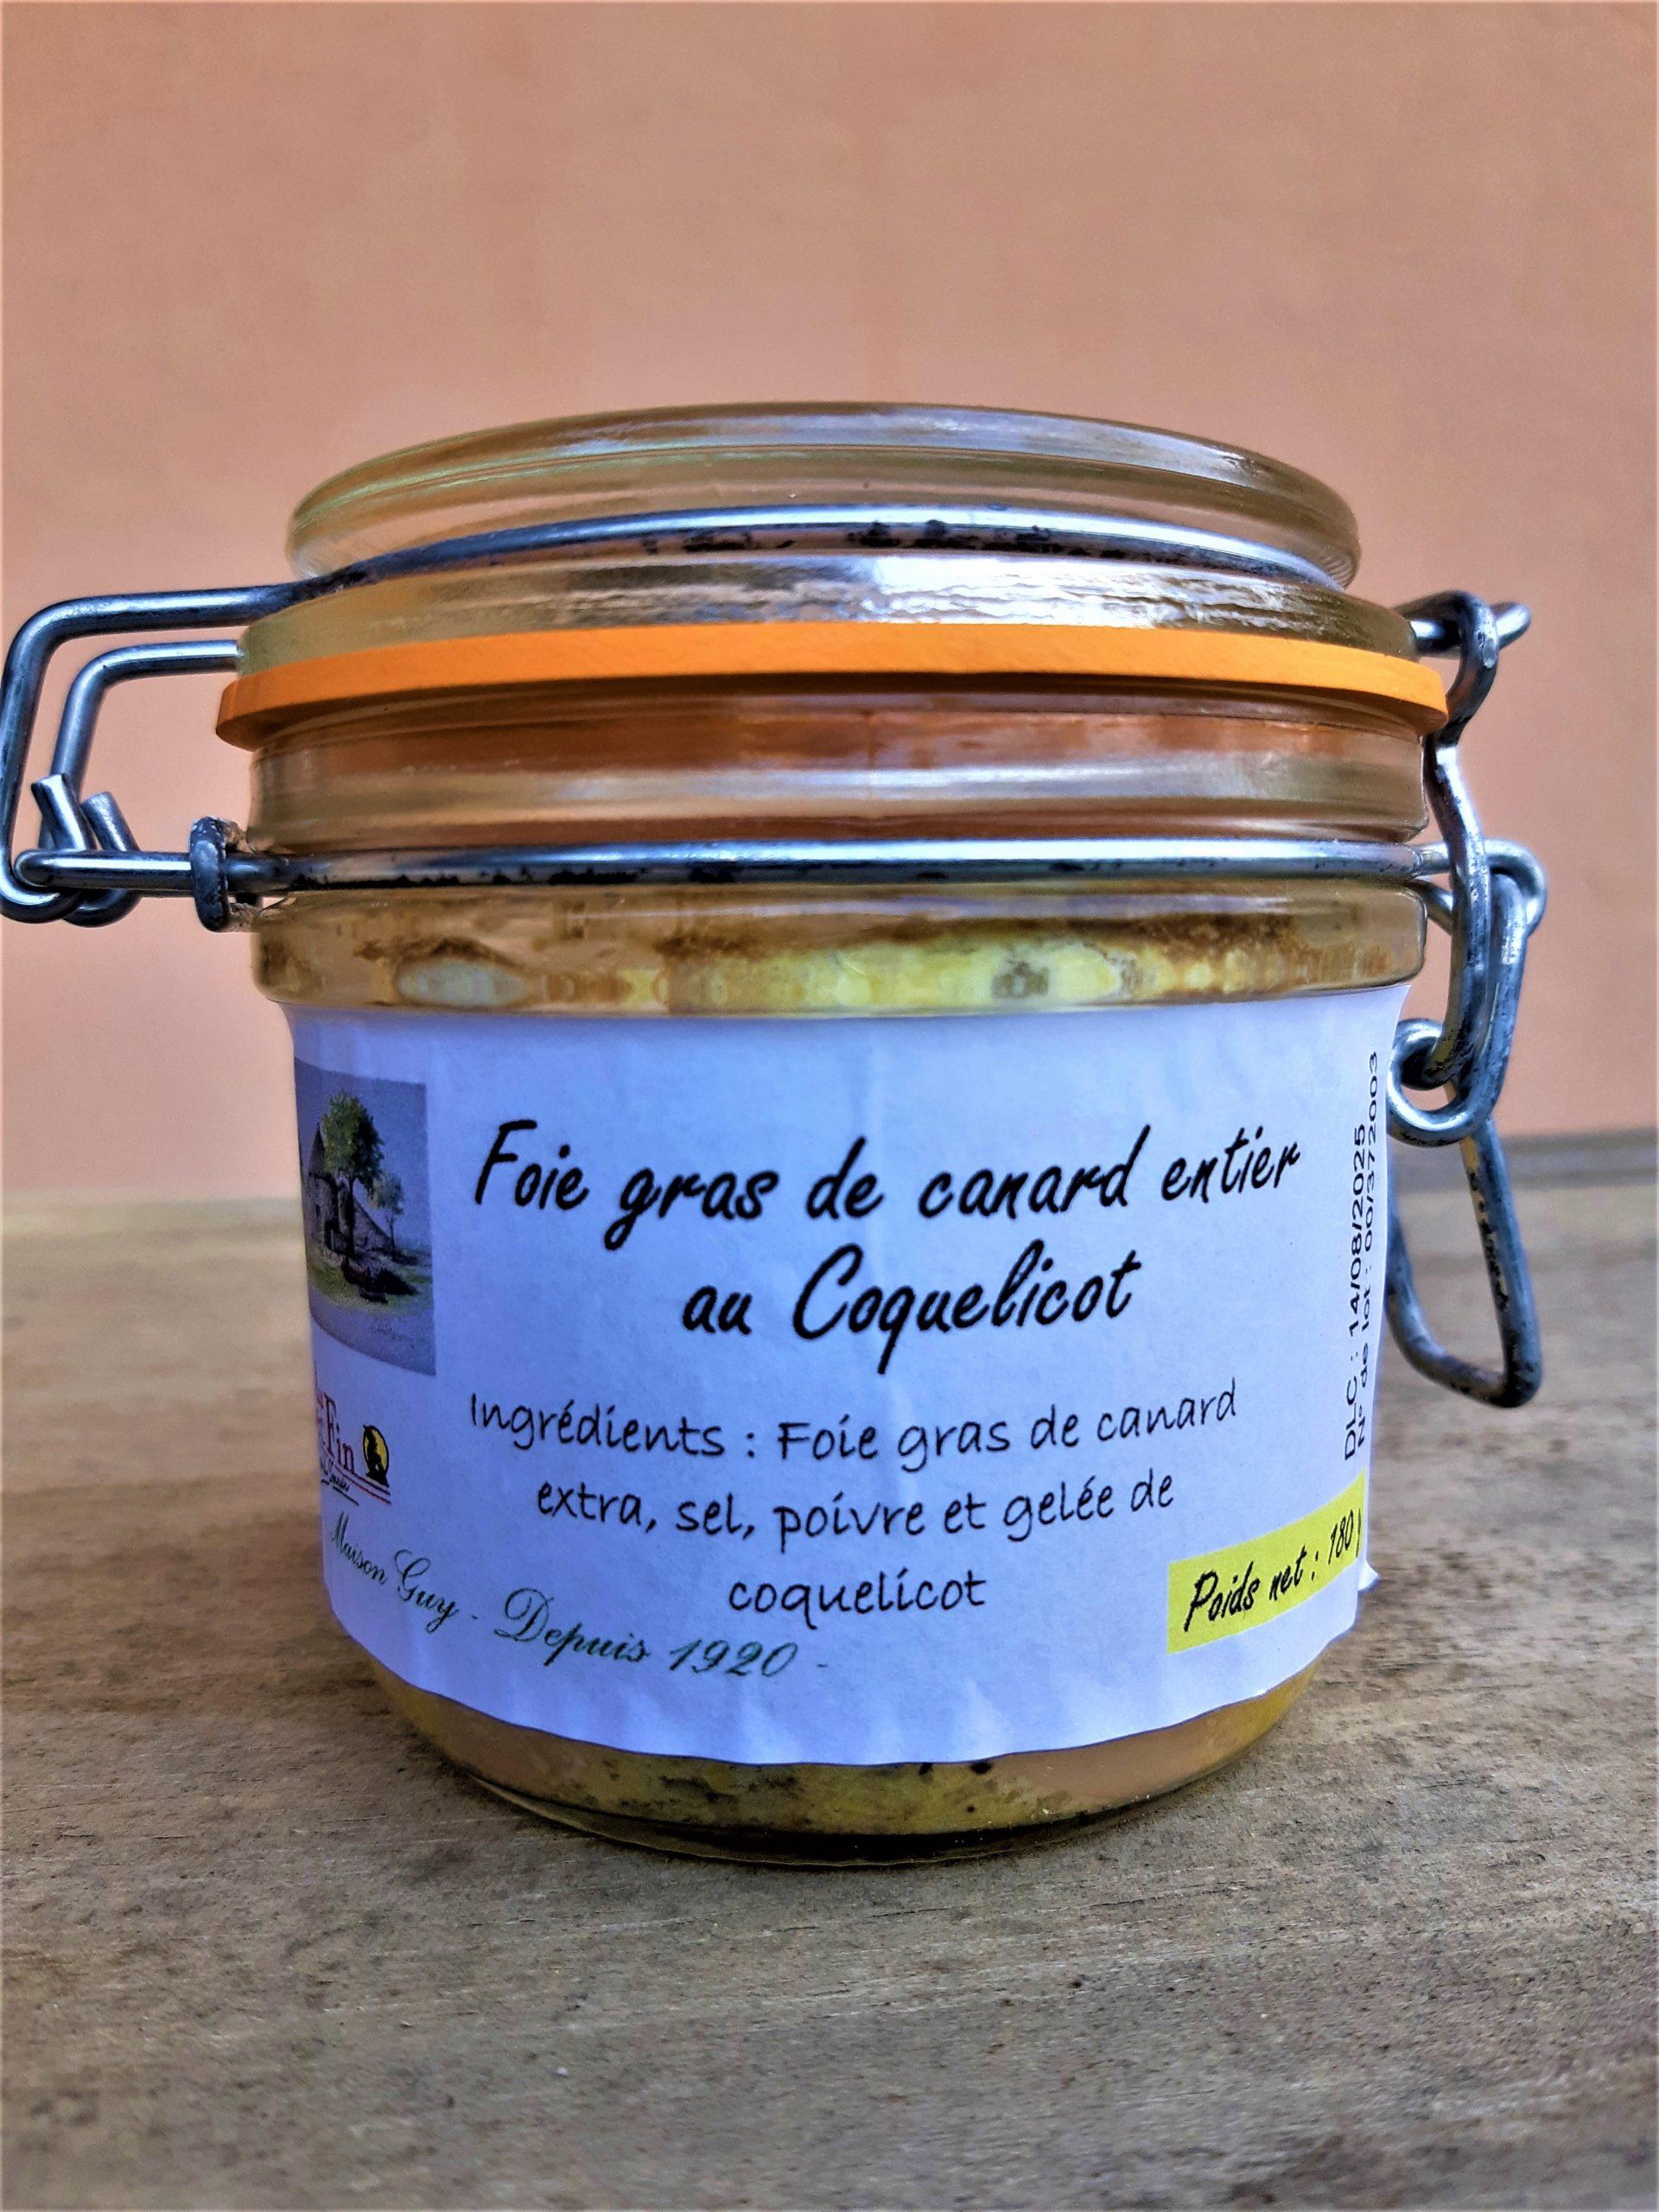 Foie Gras de Canard entier au Coquelicot